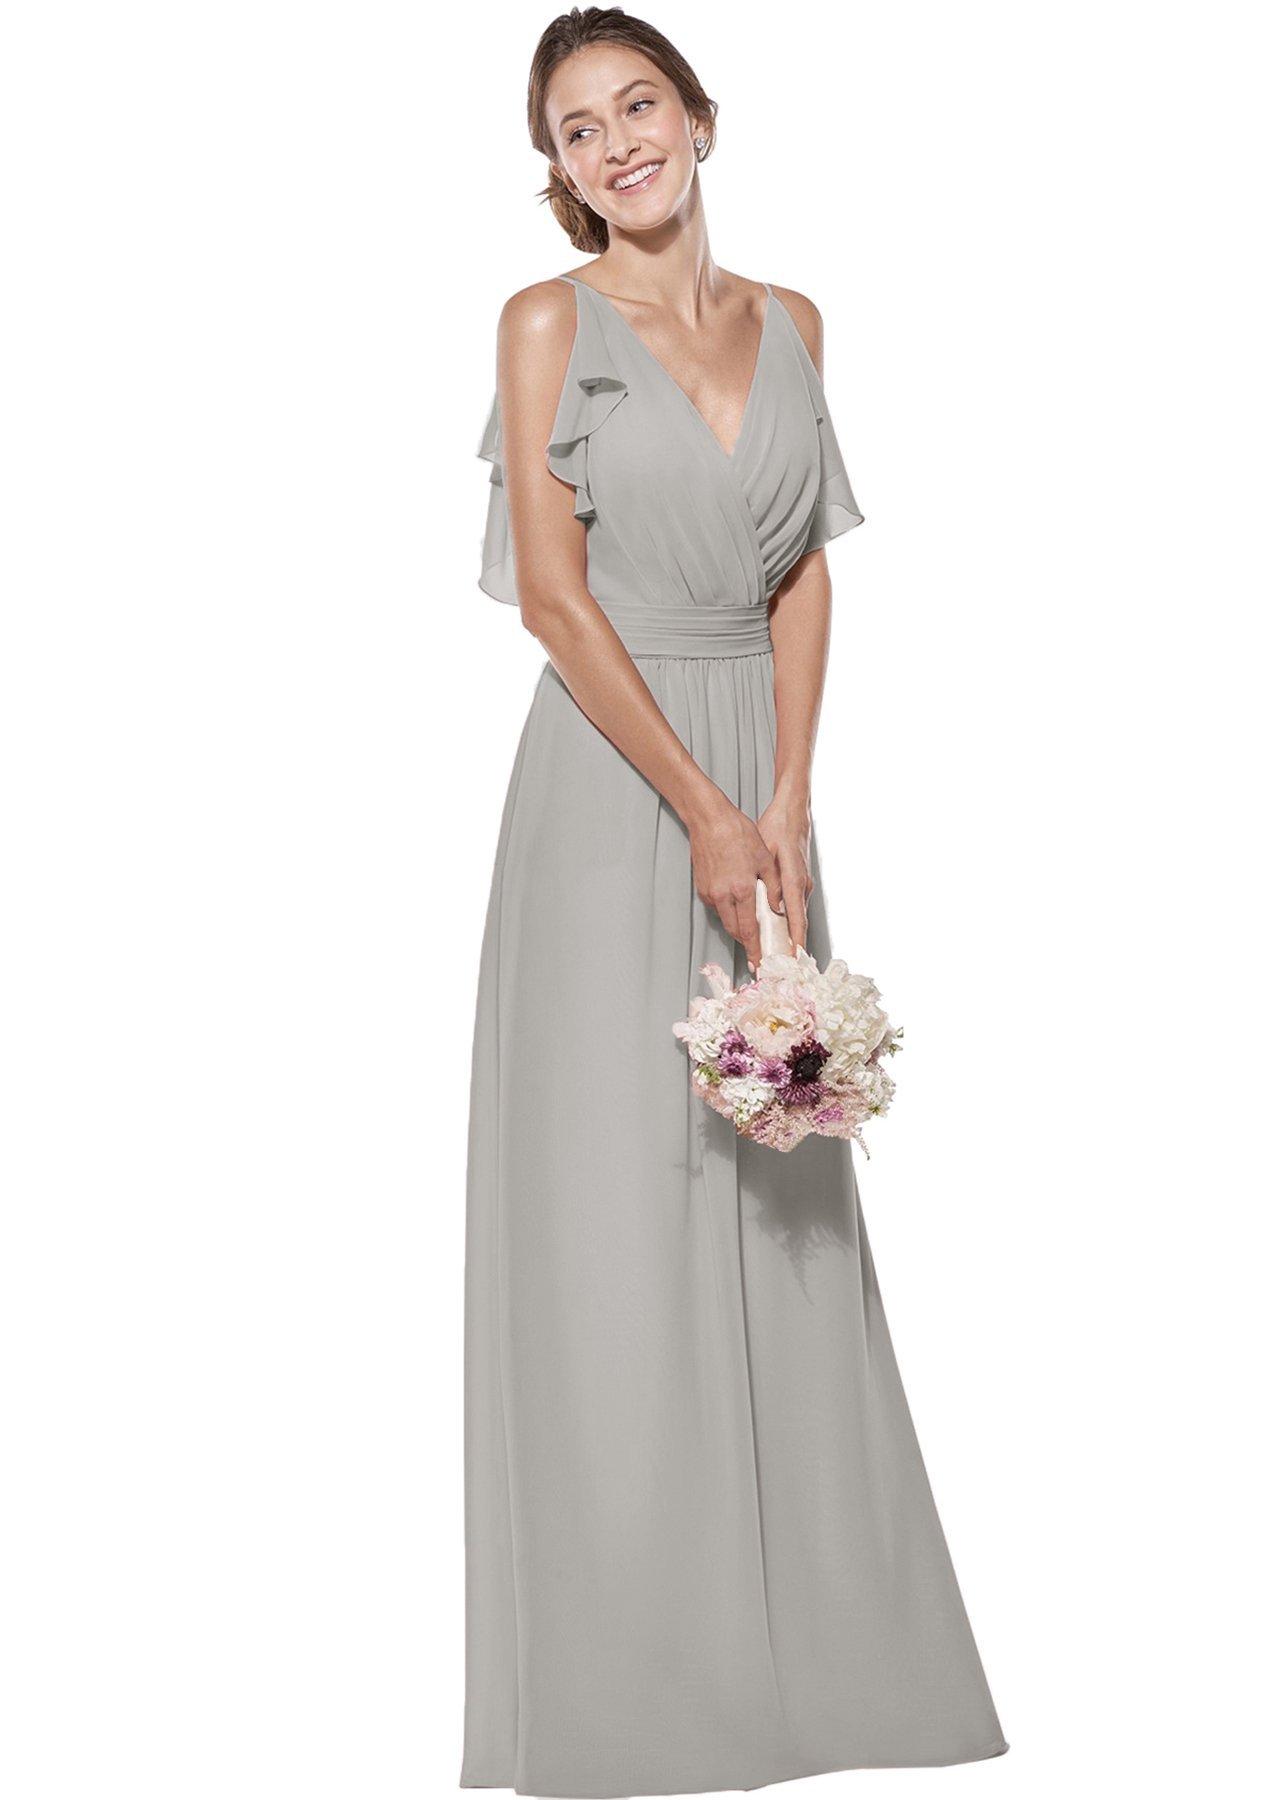 873a8f9f1c2 Zhongde Women s Elegant Floor Length Ruched Straps V Neck Chiffon Long  Bridesmaid Prom Dress Silver Grey Size 10